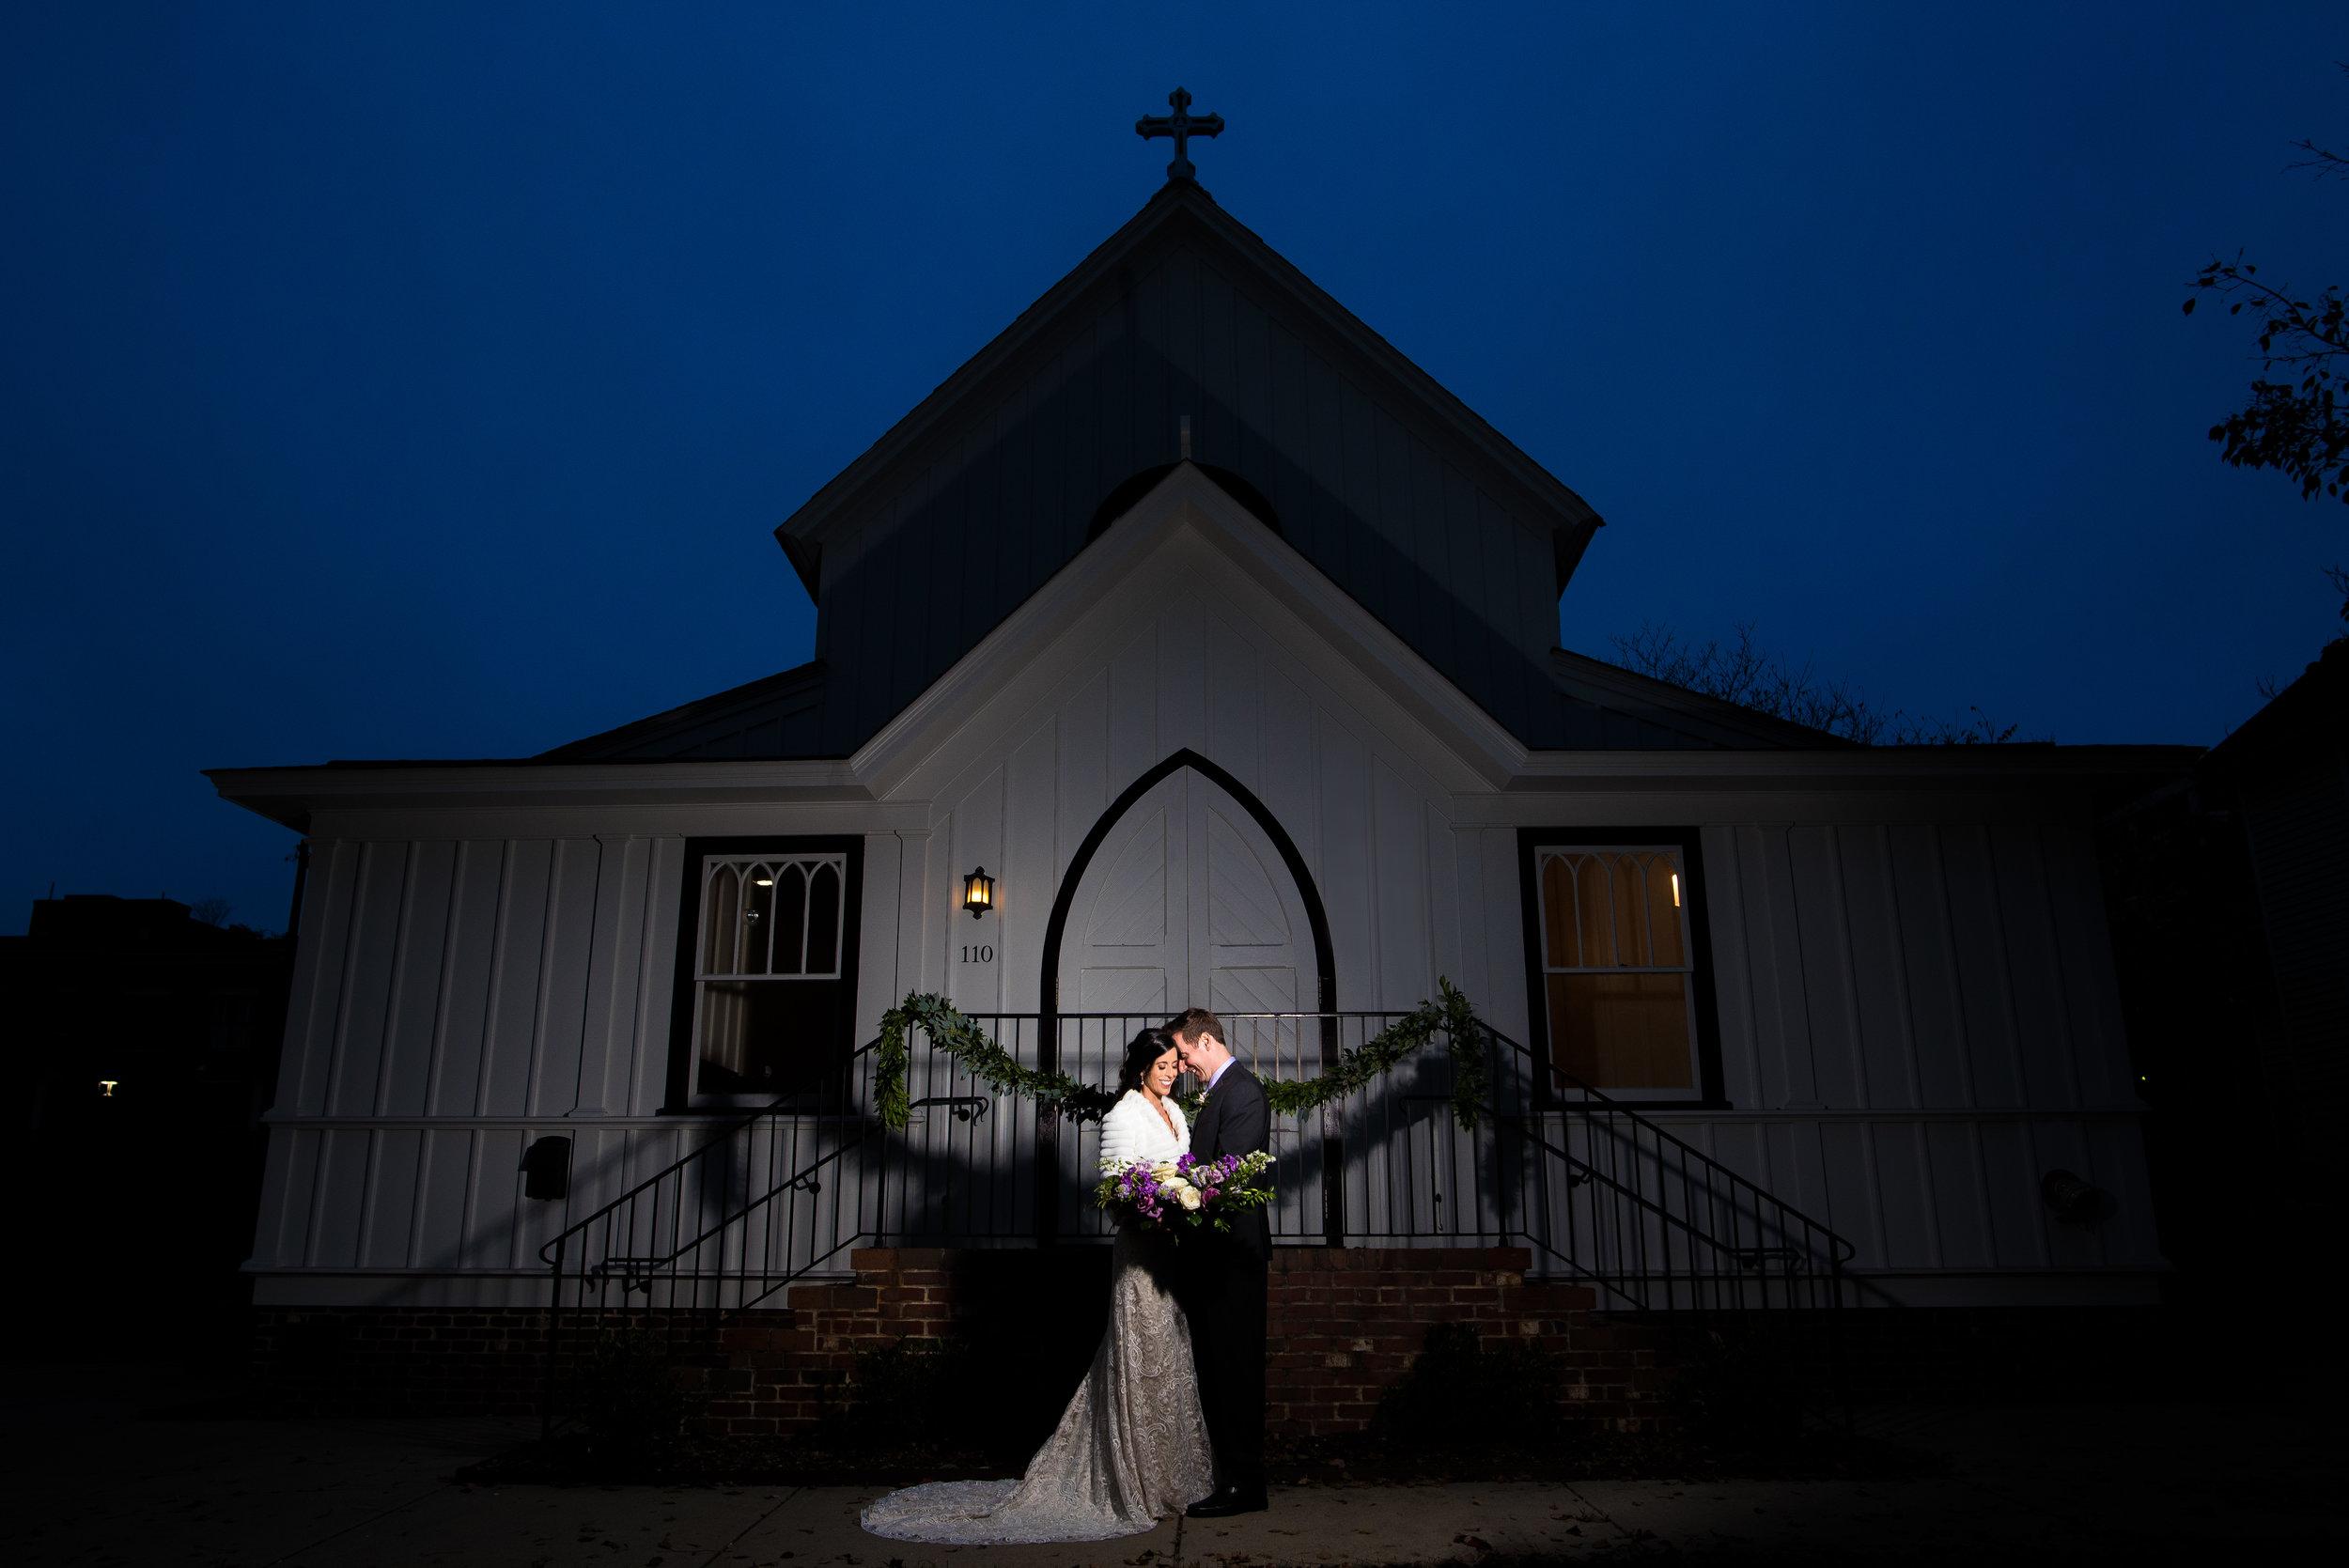 Heather & Lincoln Groves Wedding SP WEB_40.jpg